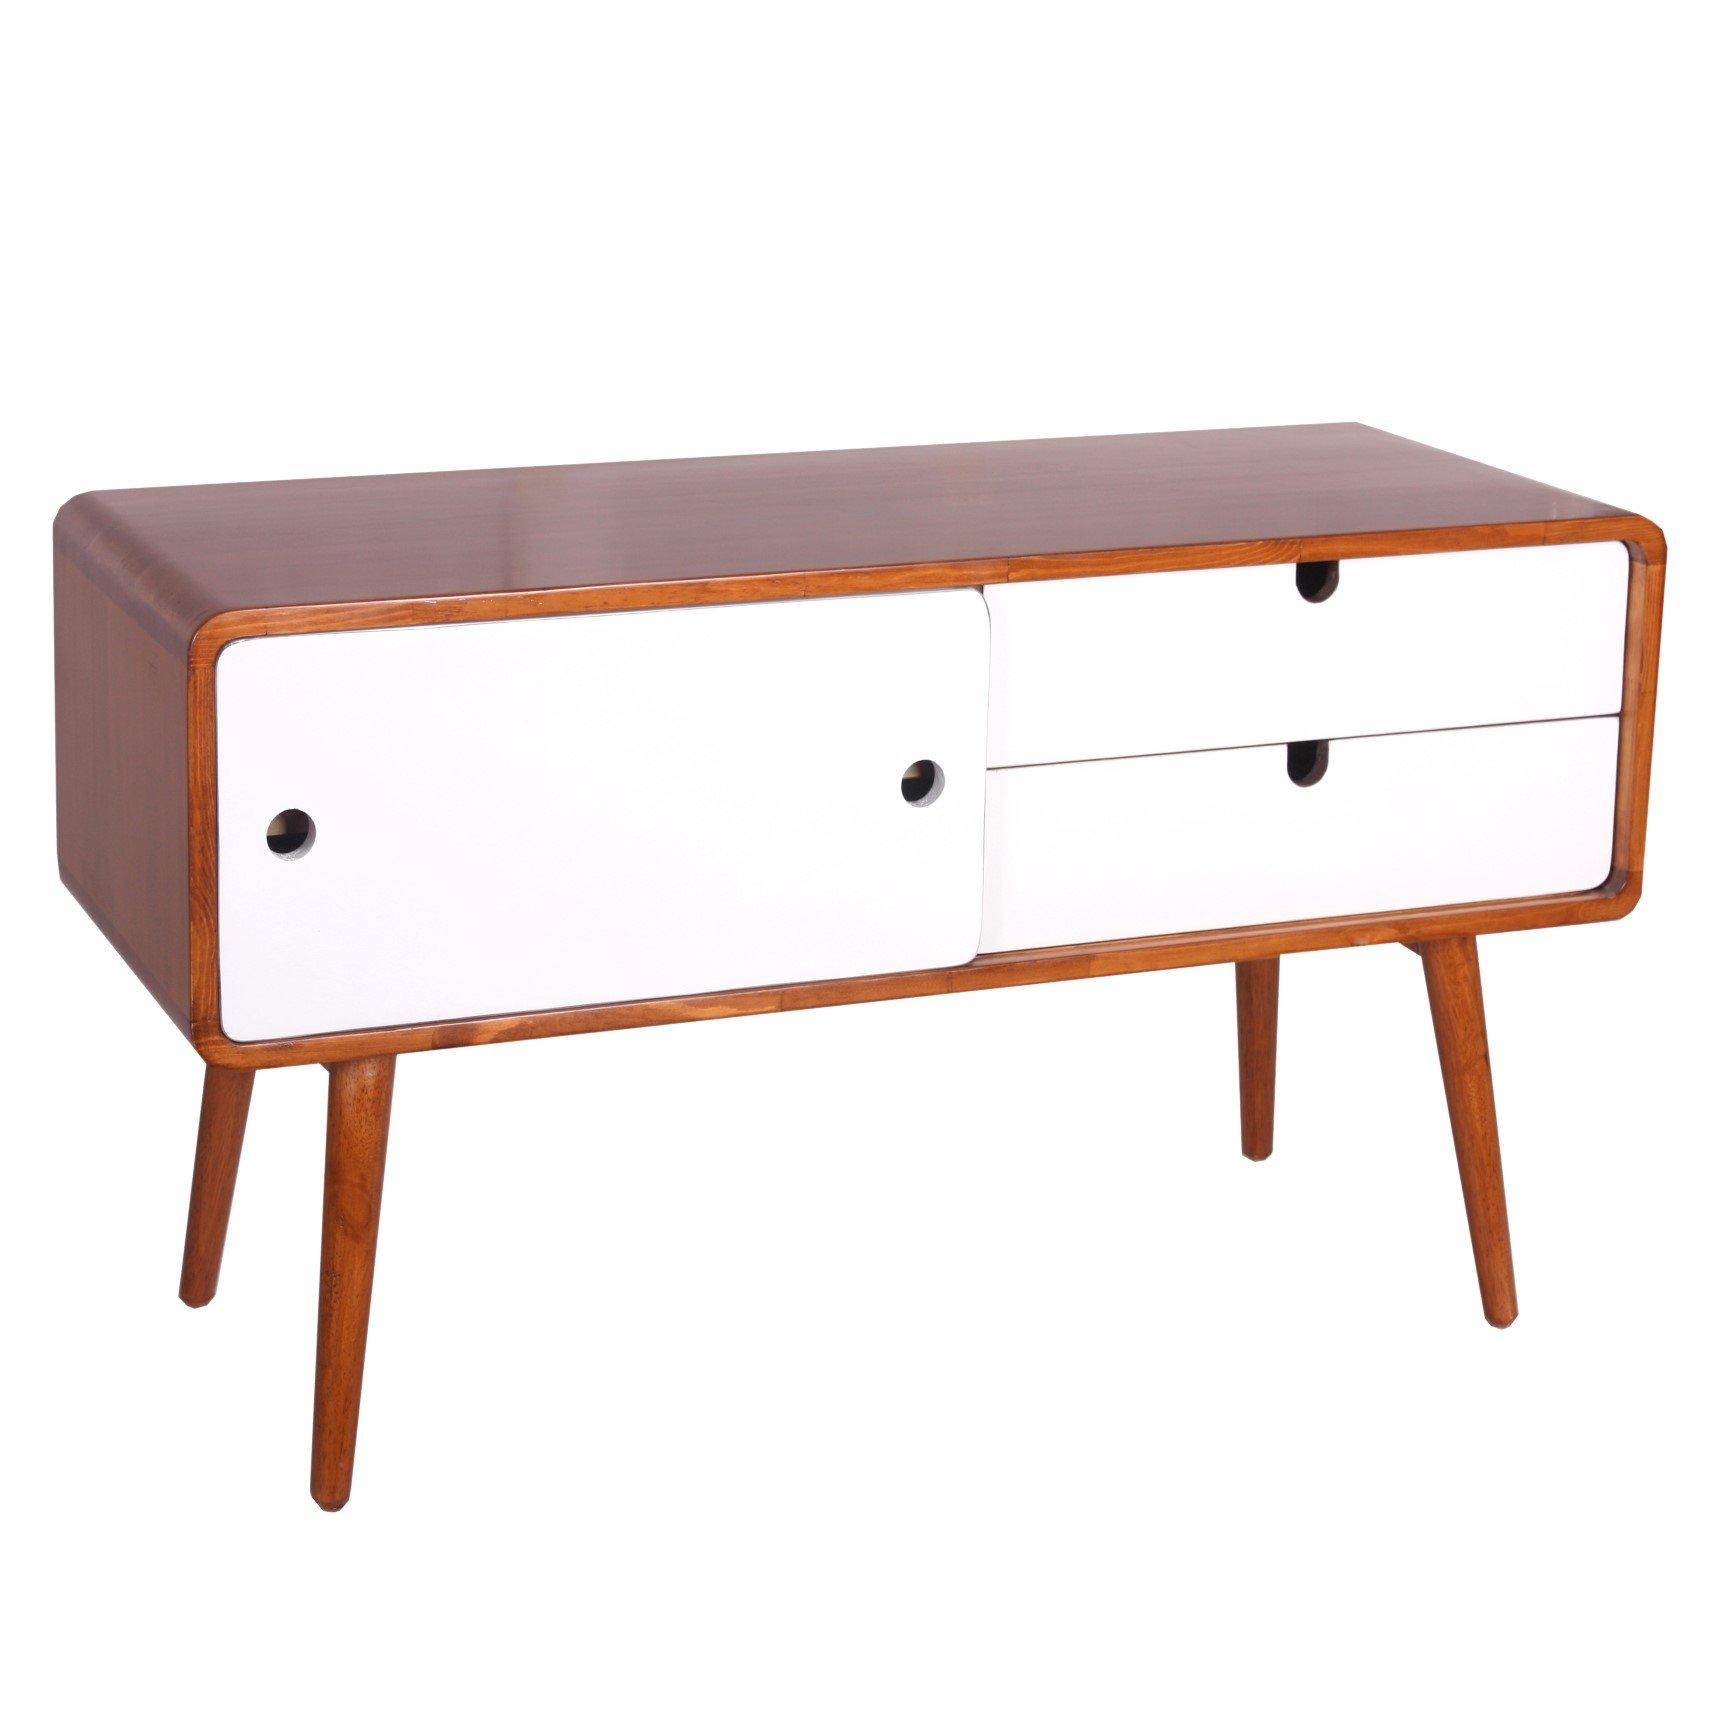 Porthos Home CB188D WHT Solstice Media Table, Large, White by Porthos Home